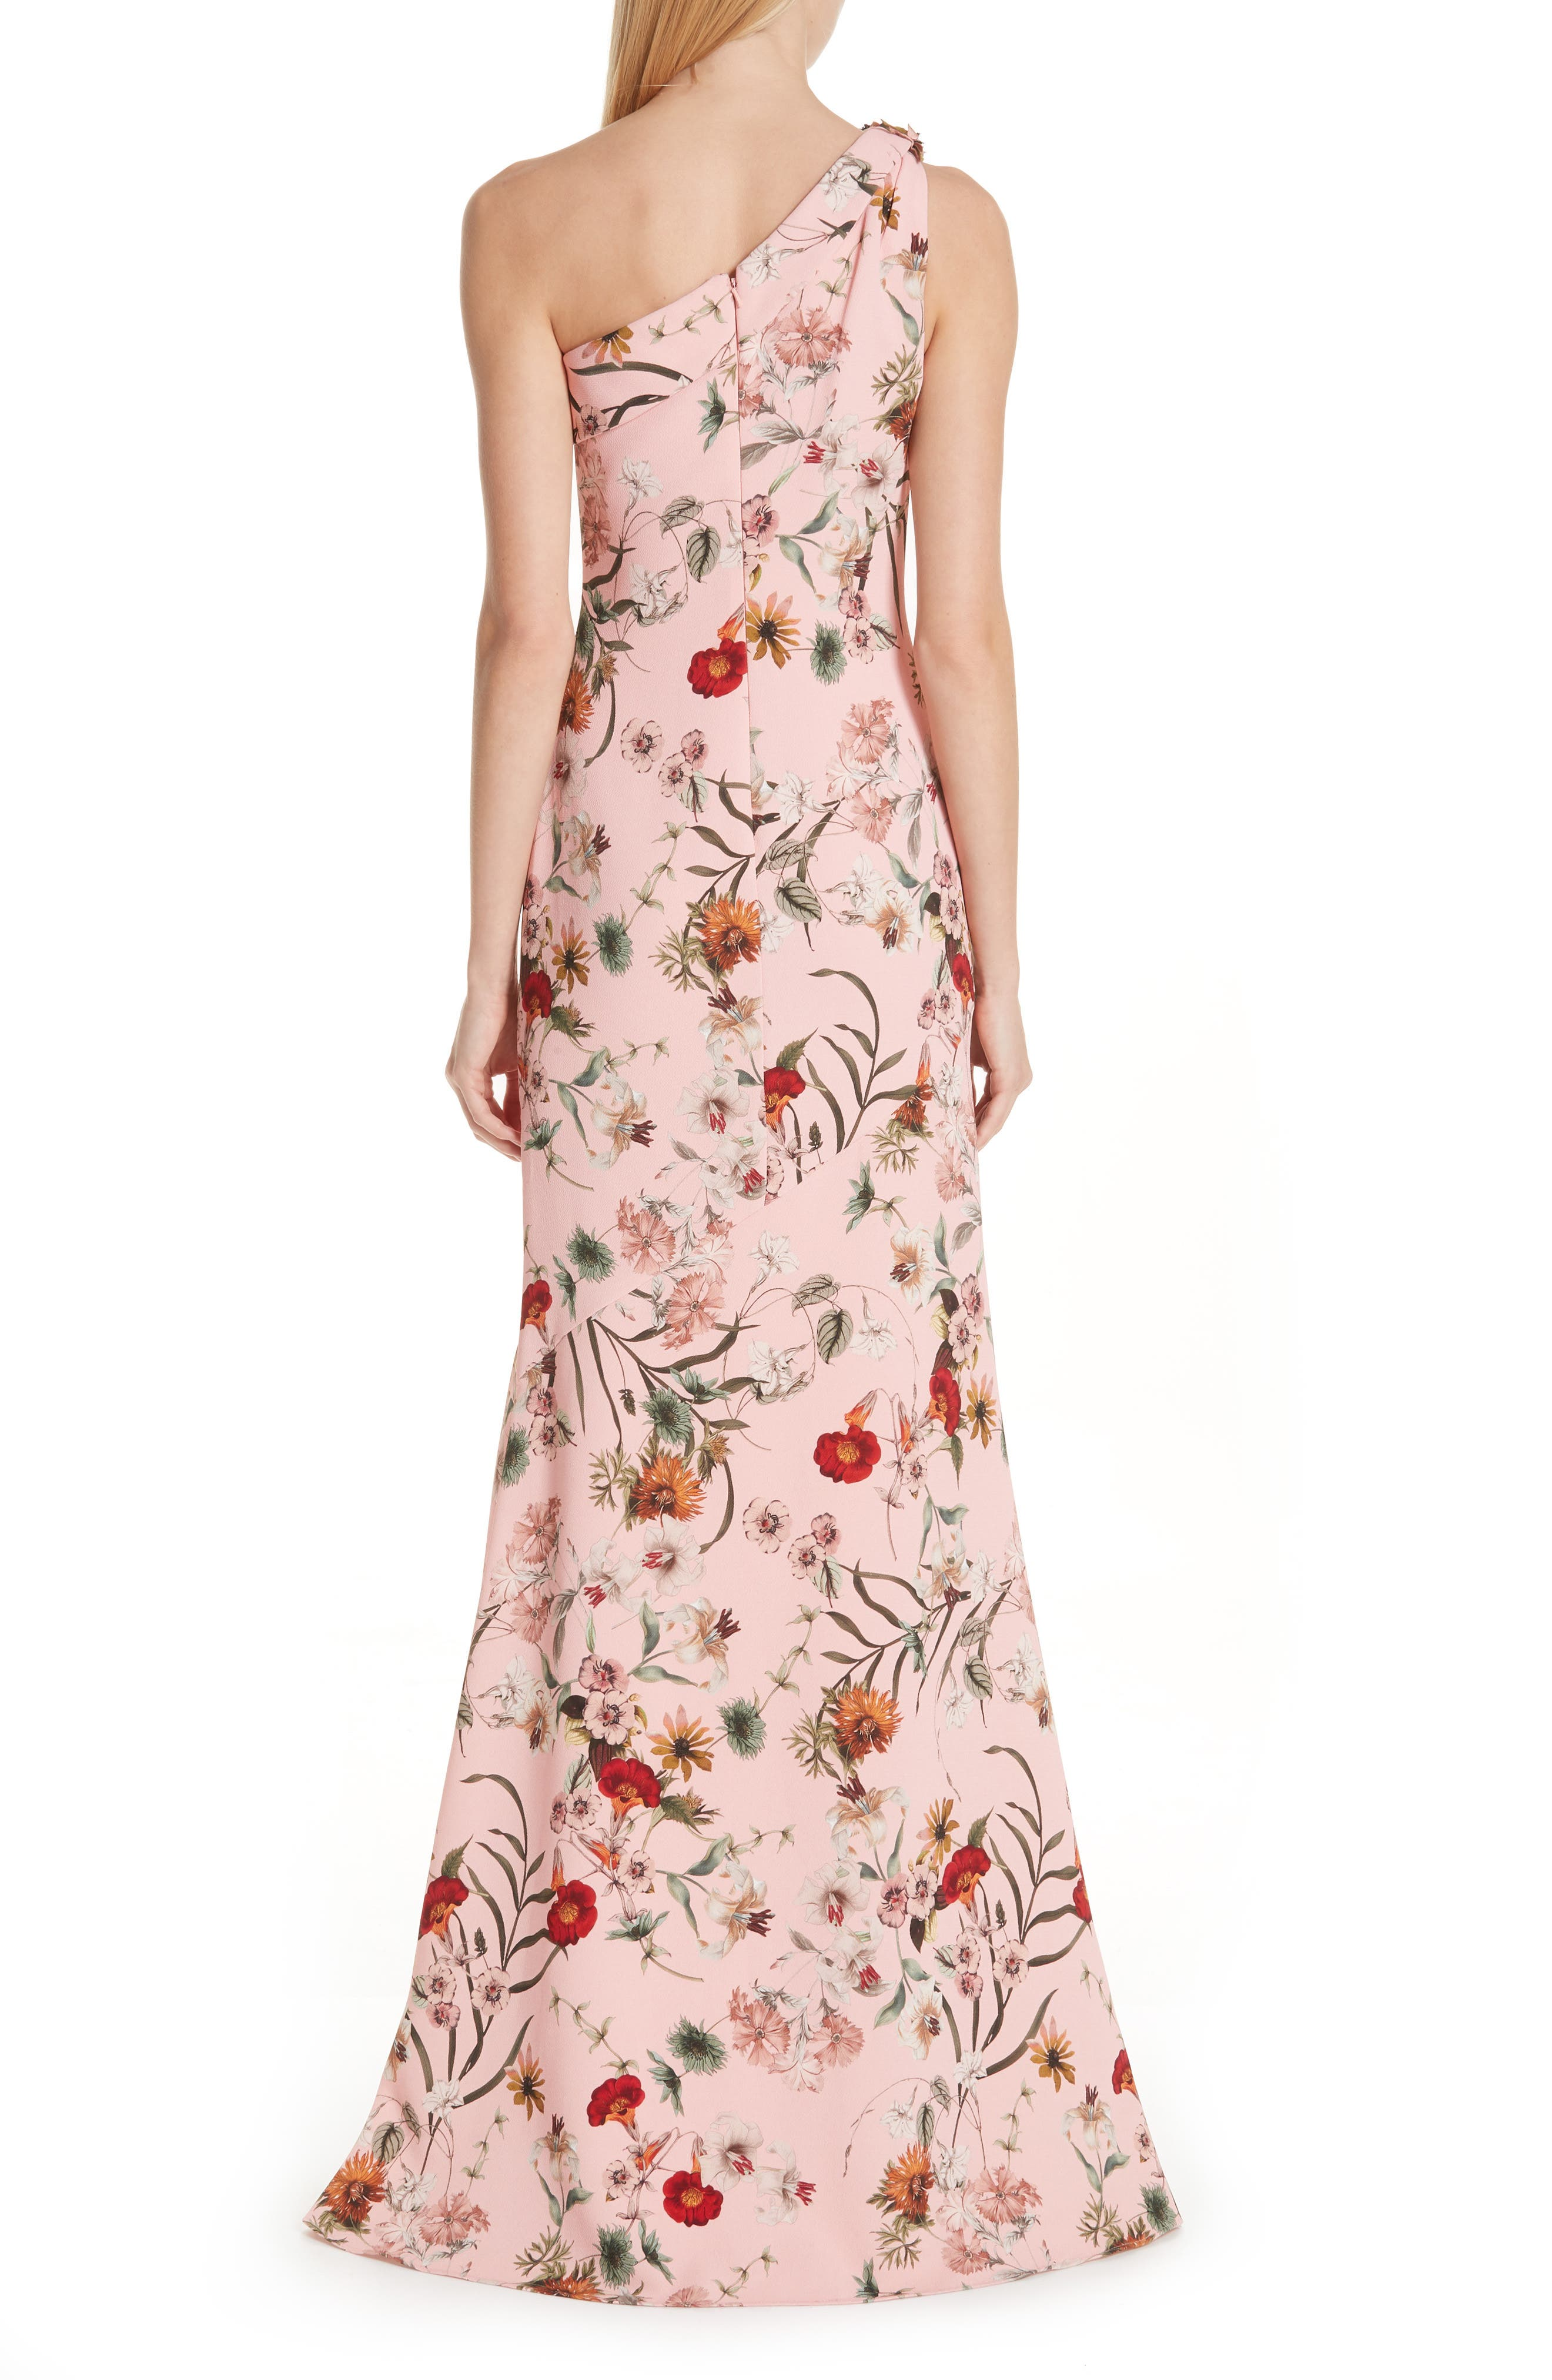 BADGLEY MISCHKA COLLECTION,                             Badgley Mischka One-Shoulder Floral Evening Dress,                             Alternate thumbnail 2, color,                             650